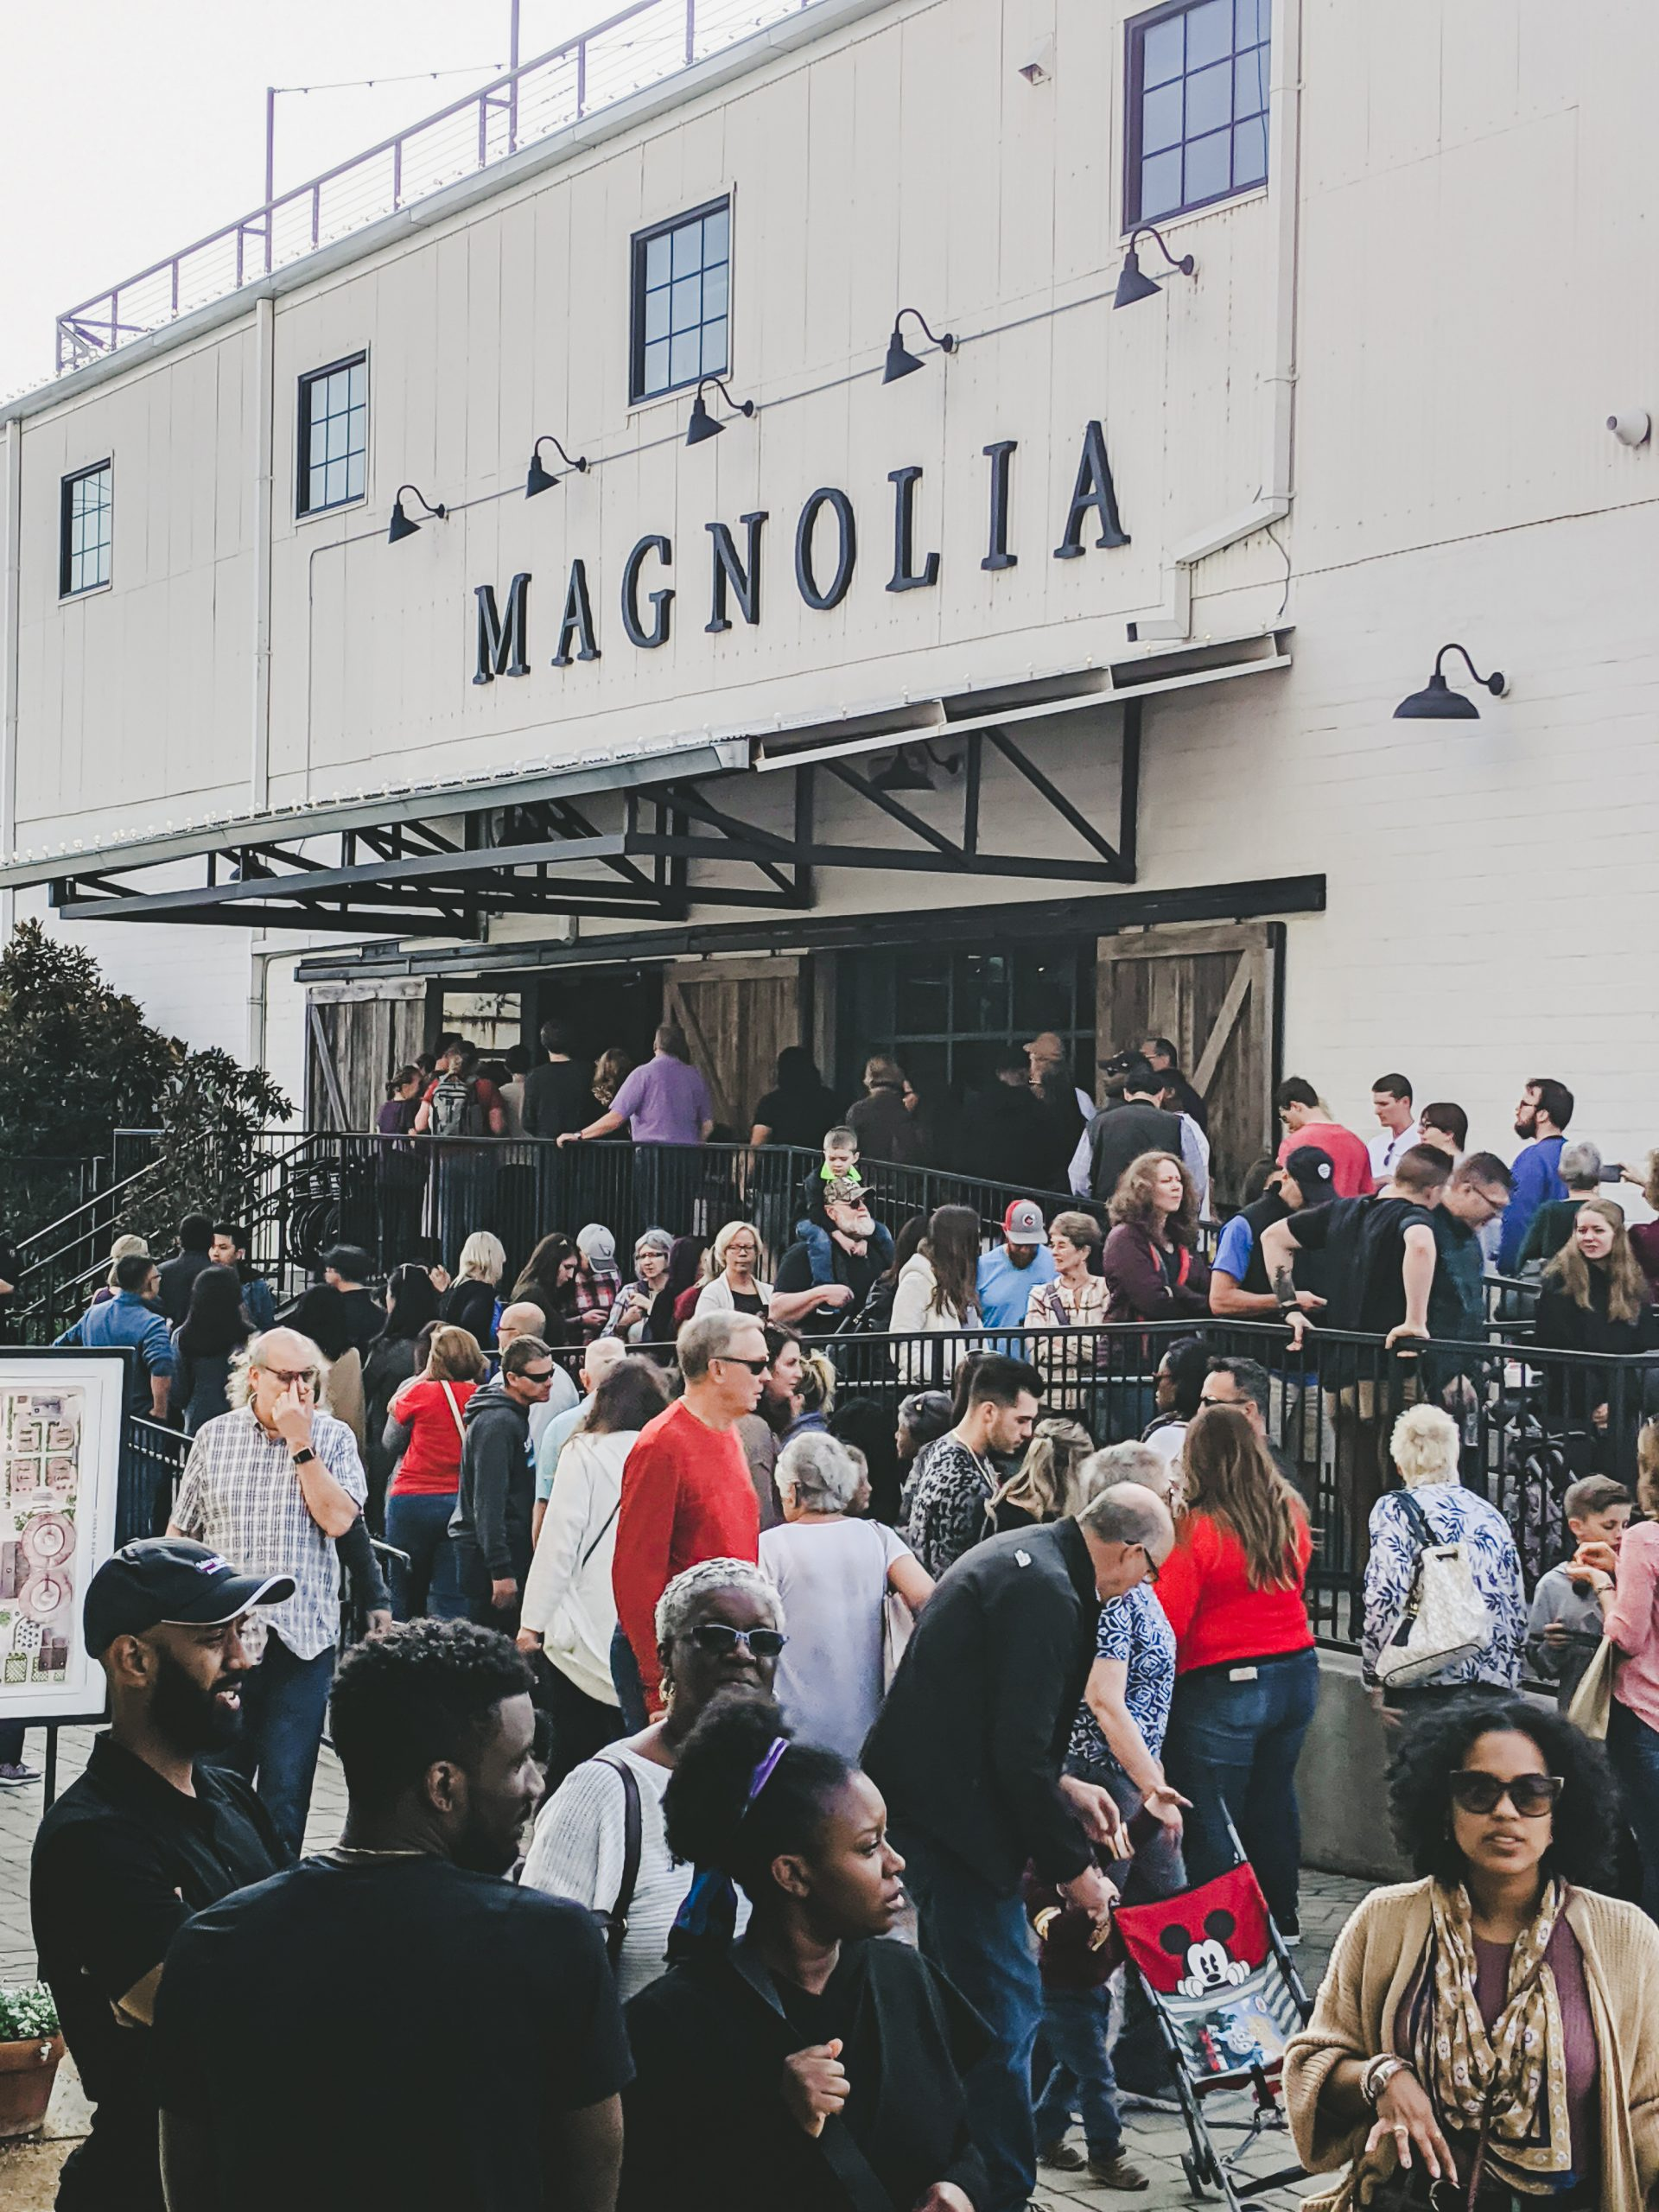 magnolia market storefront